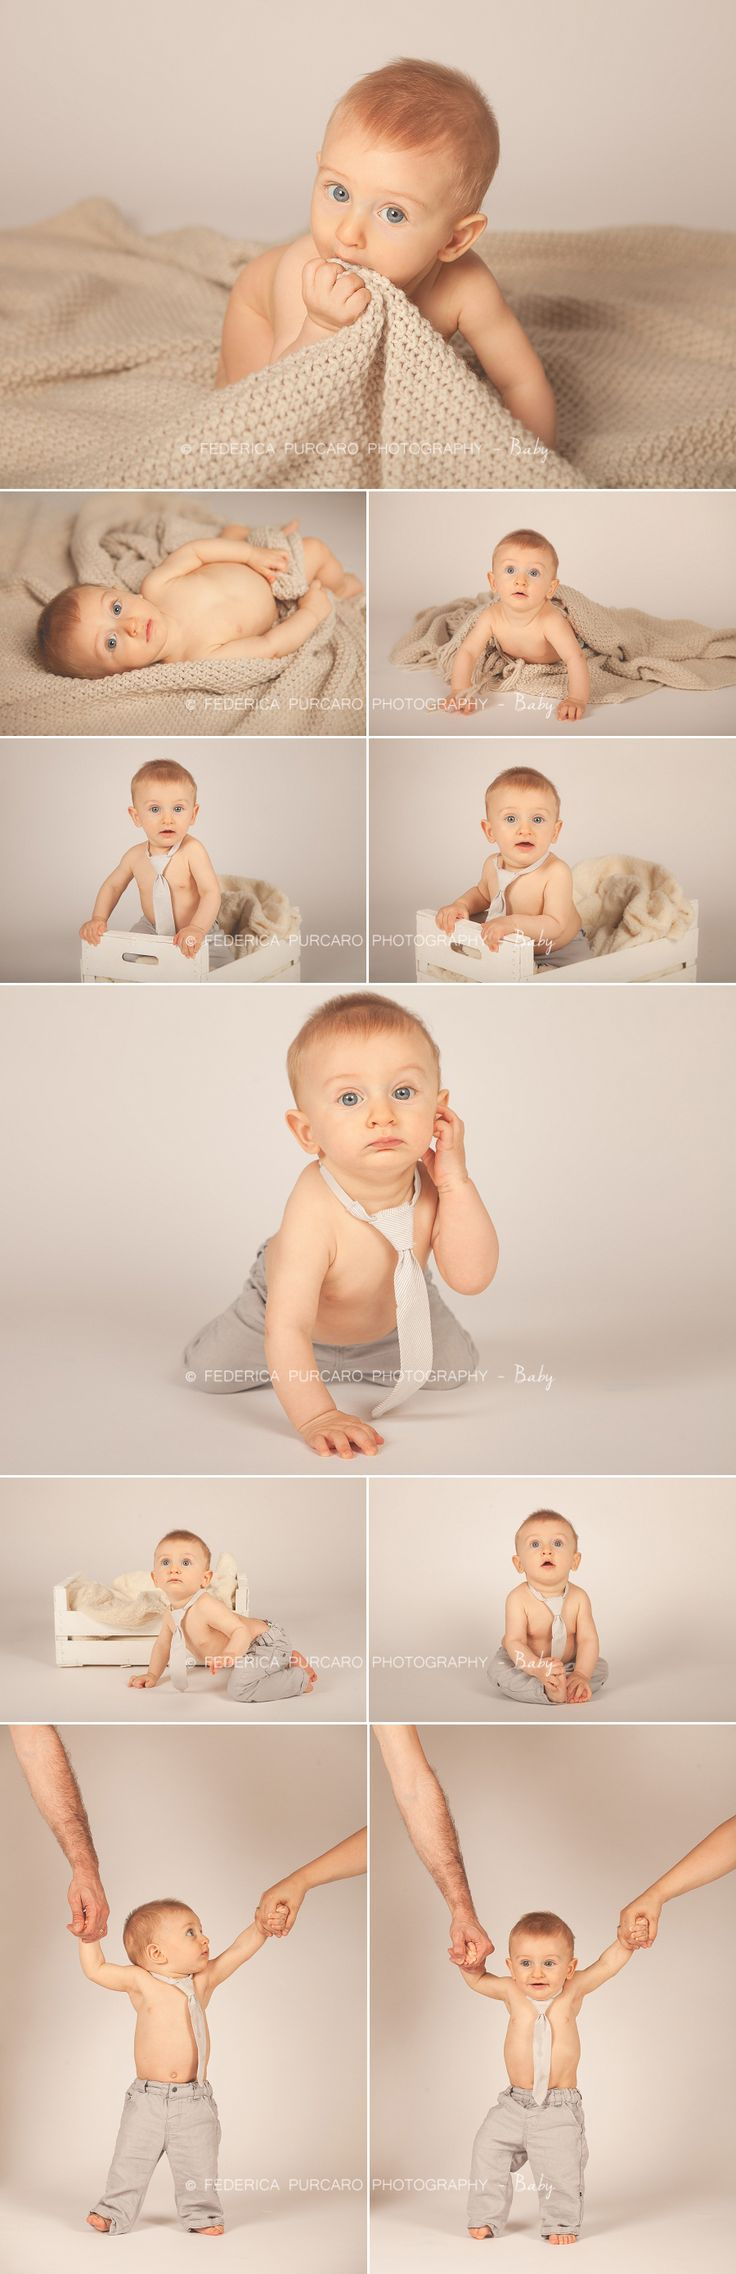 fotografia bambini - kids photography - Federica Purcaro Photography